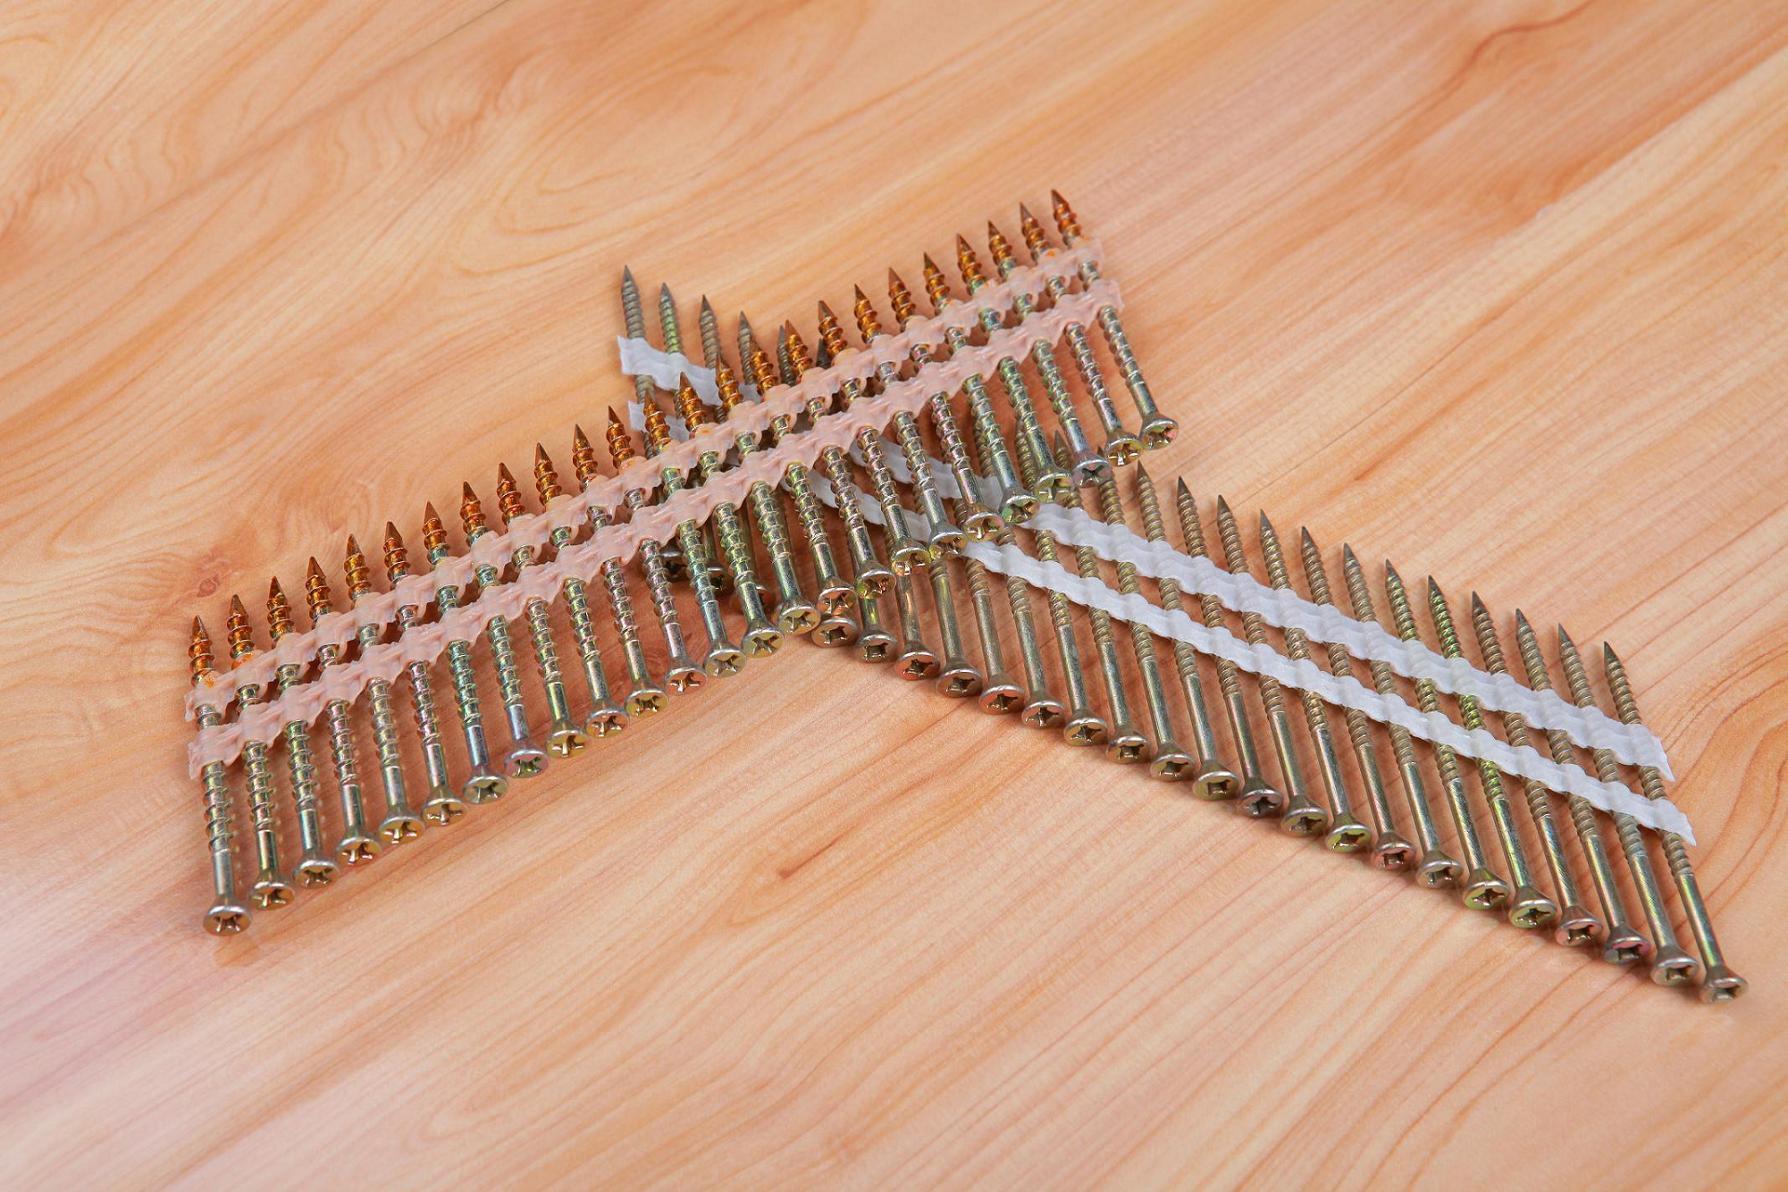 Nailscrew 16 Deg Wire Collated Screw